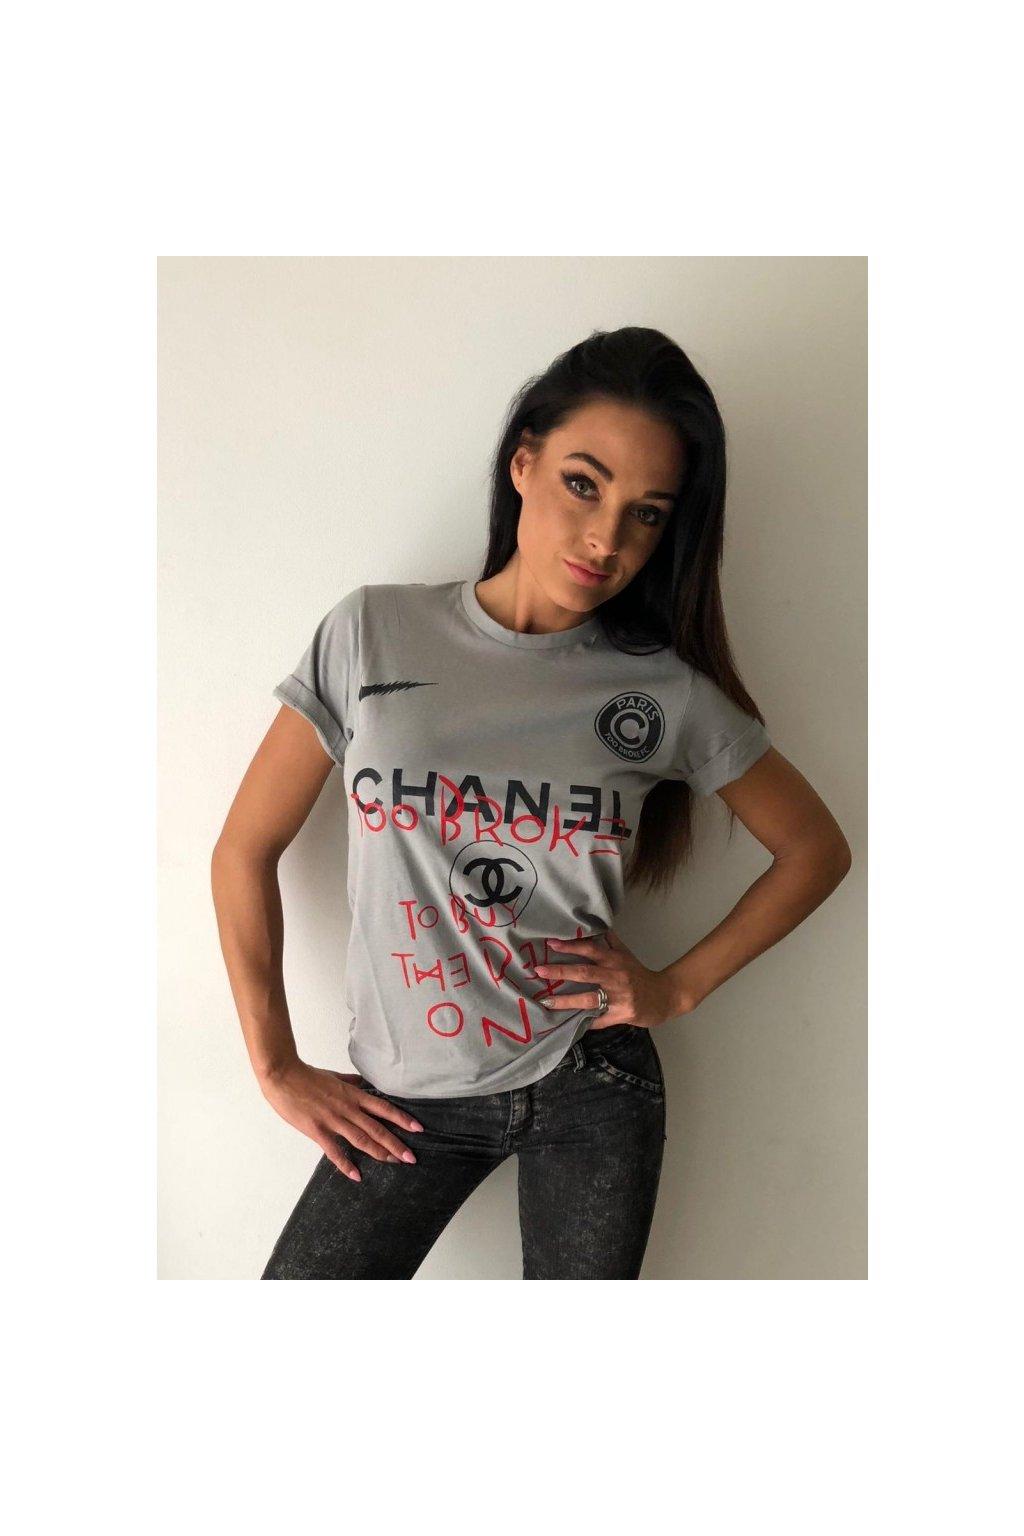 Tričko TooBroke s nápisem Chanel - šedé (Velikost Velikost XS)